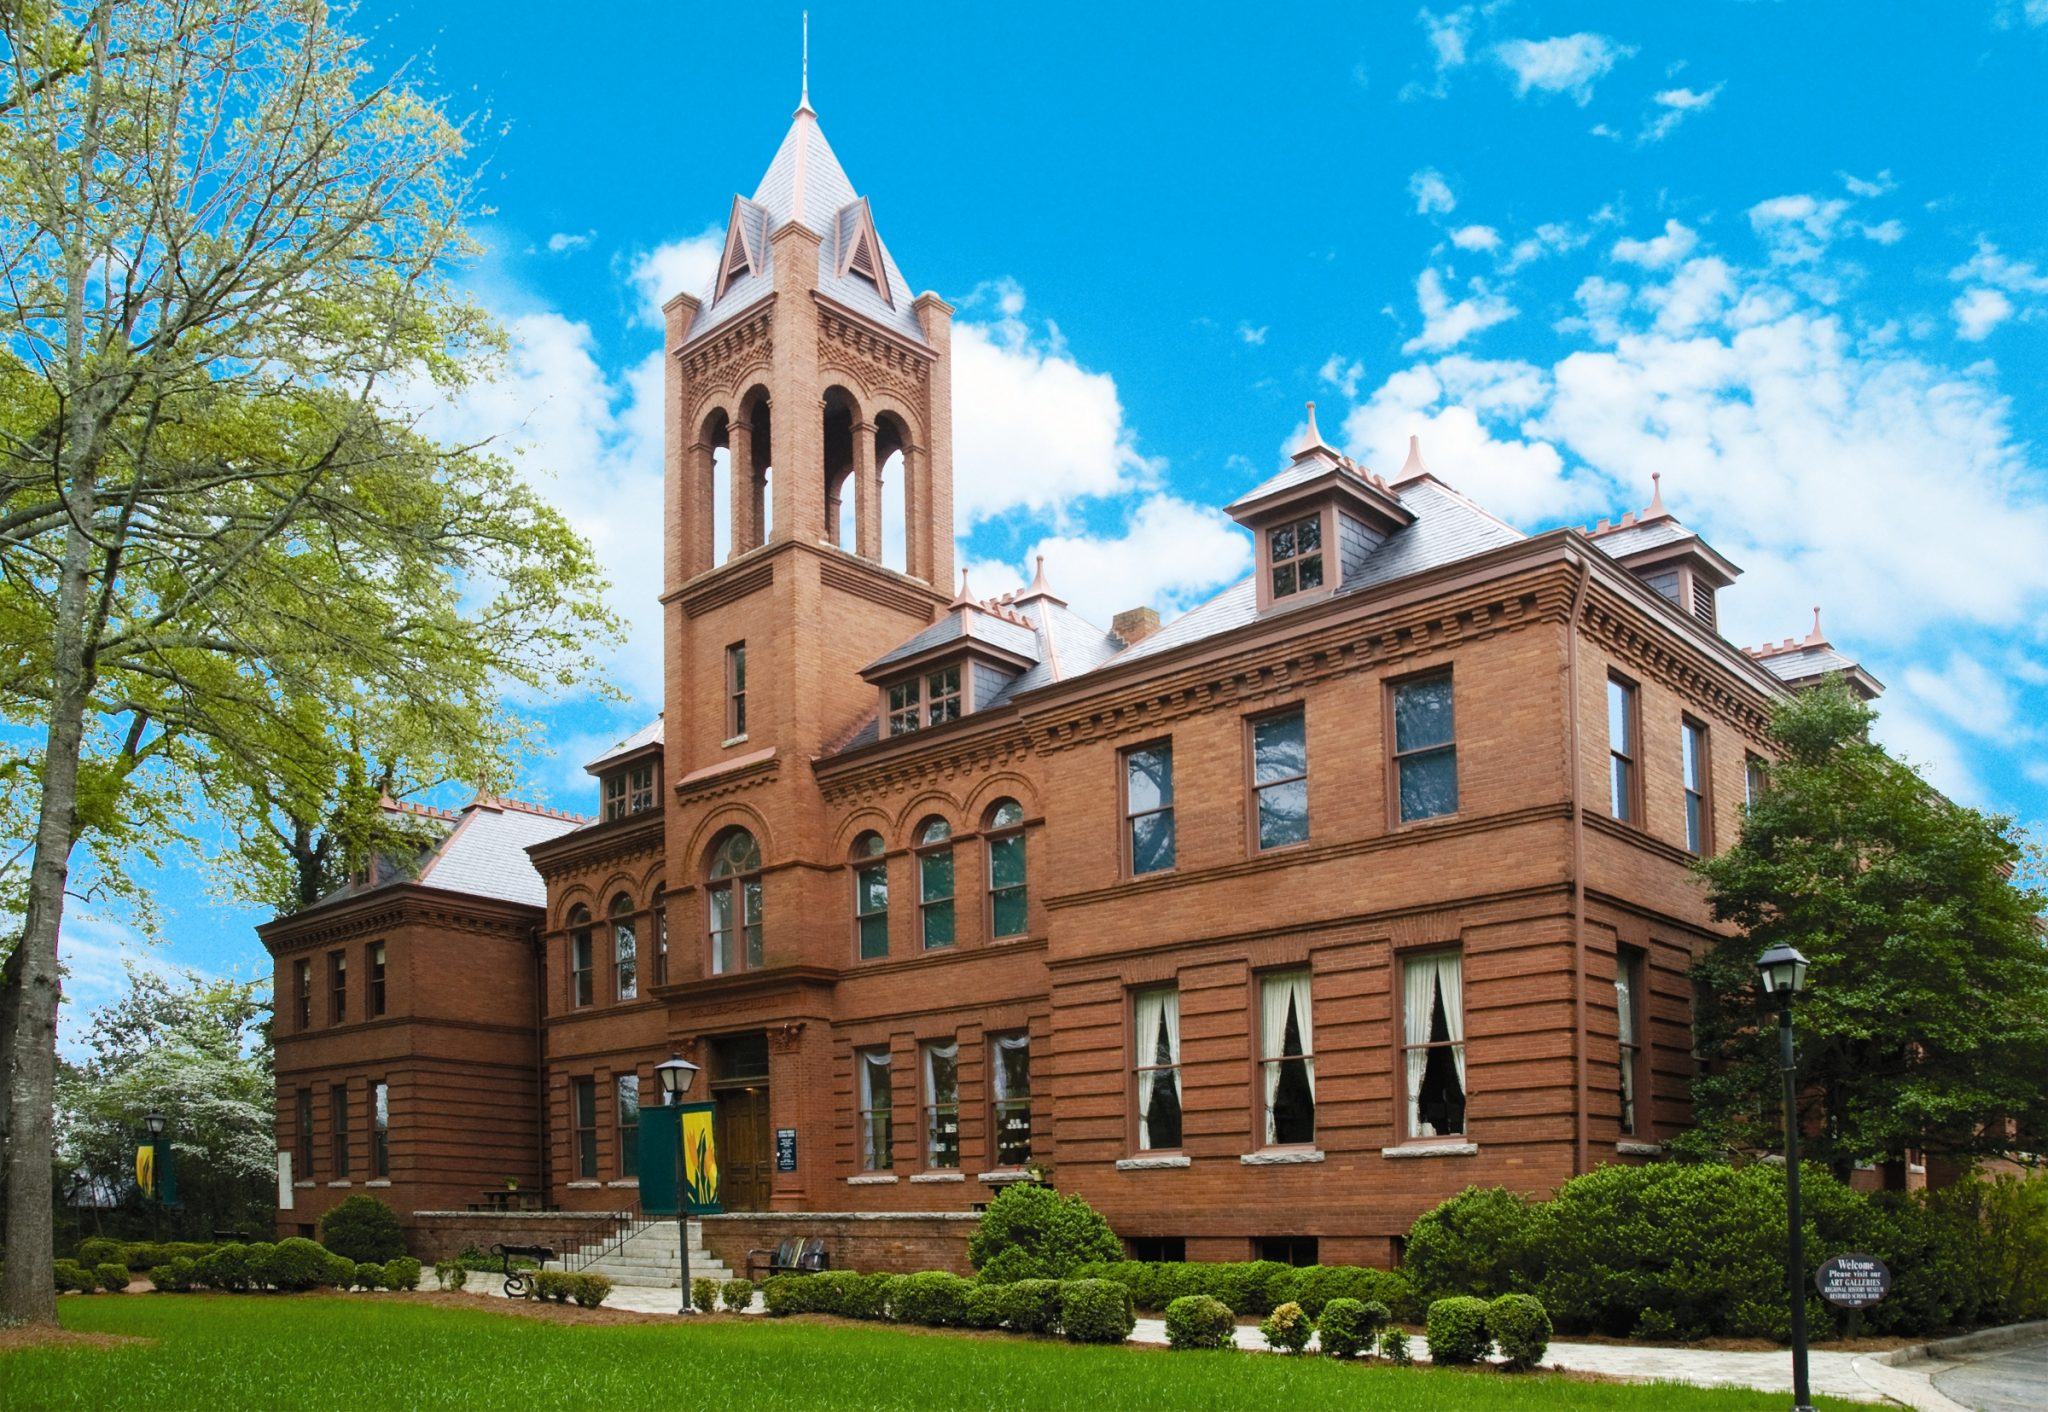 Madison-Morgan Cultural Center